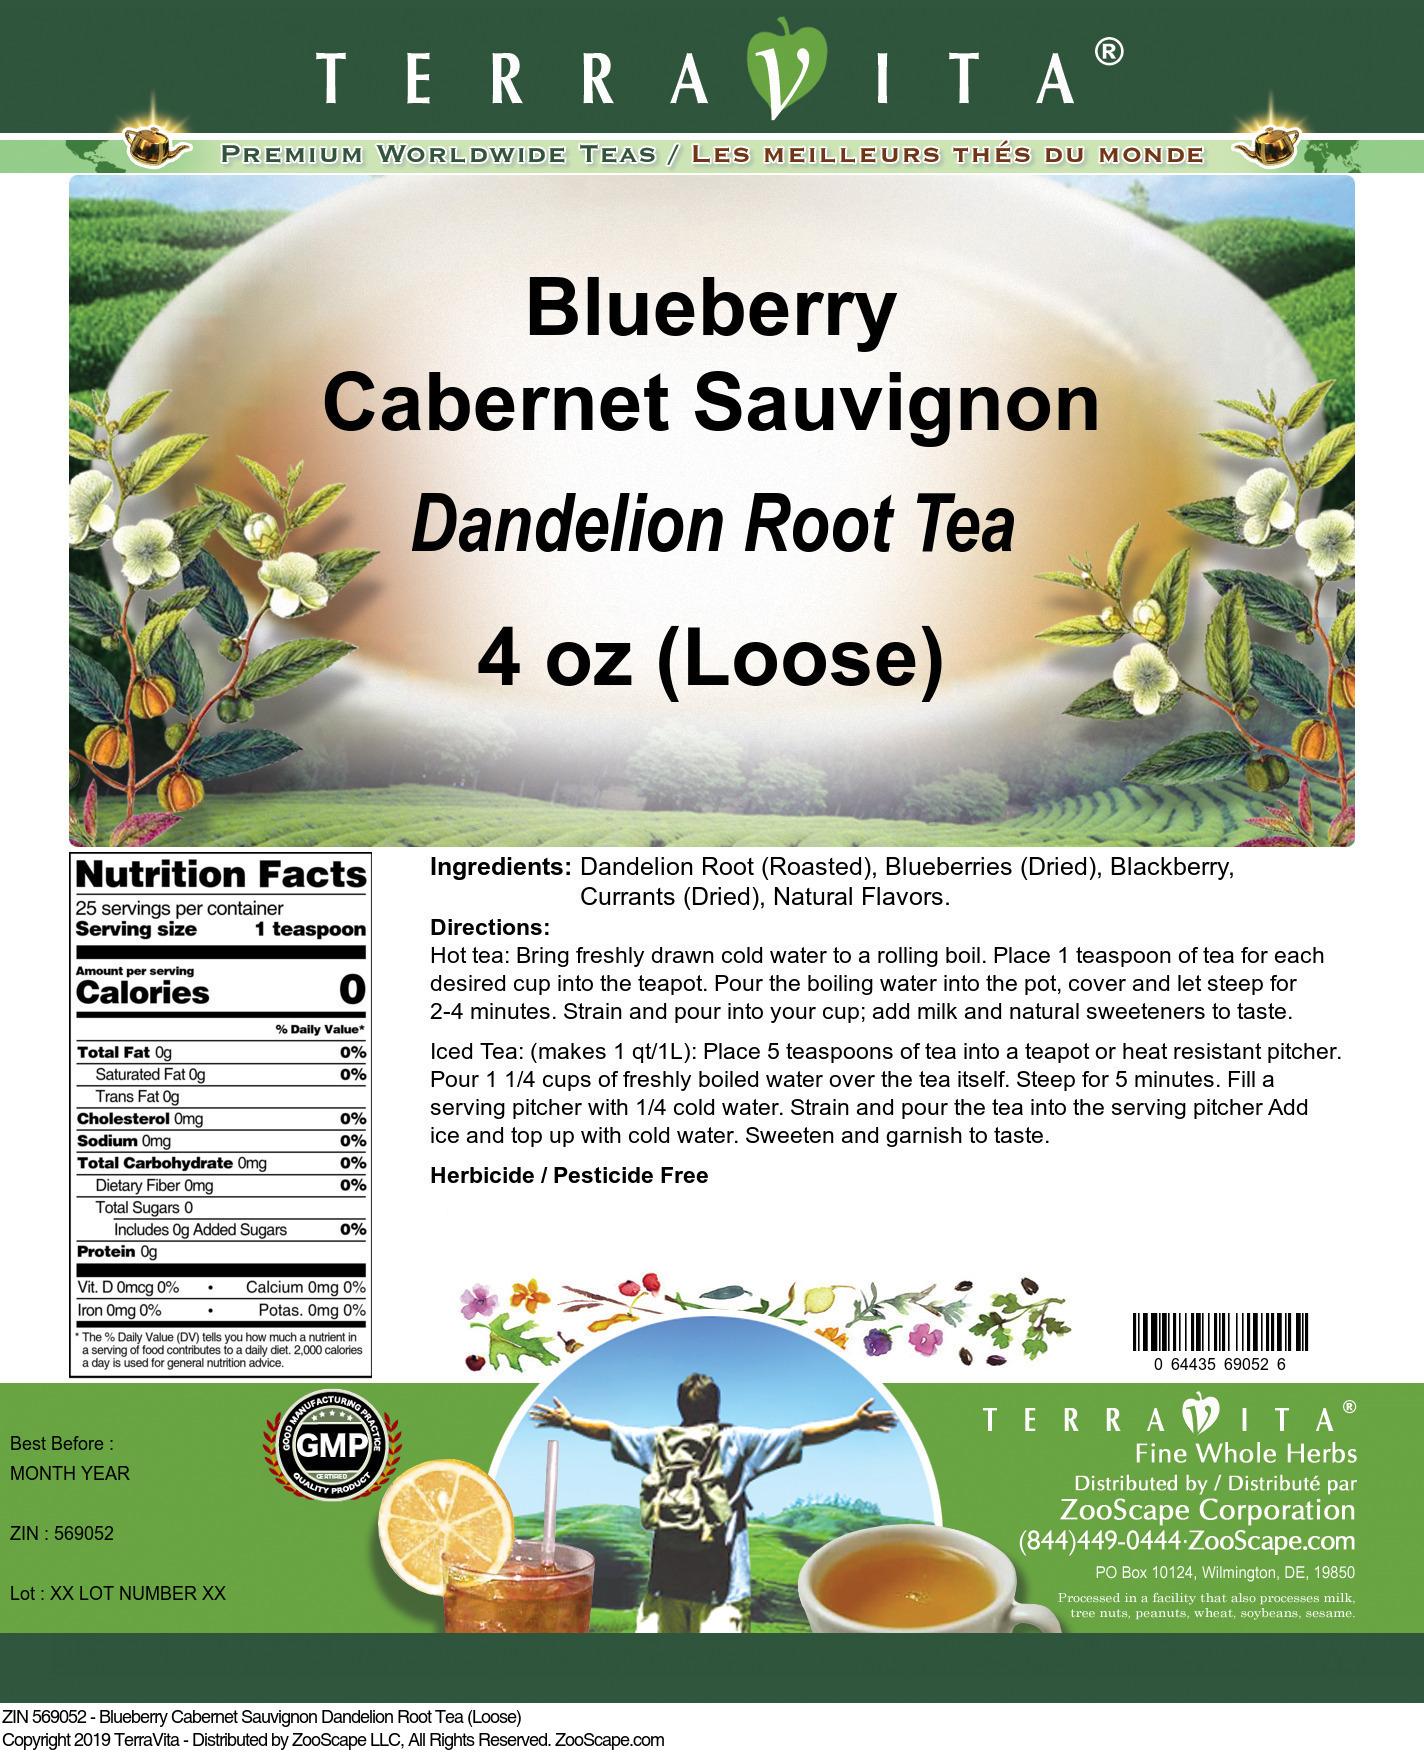 Blueberry Cabernet Sauvignon Dandelion Root Tea (Loose)